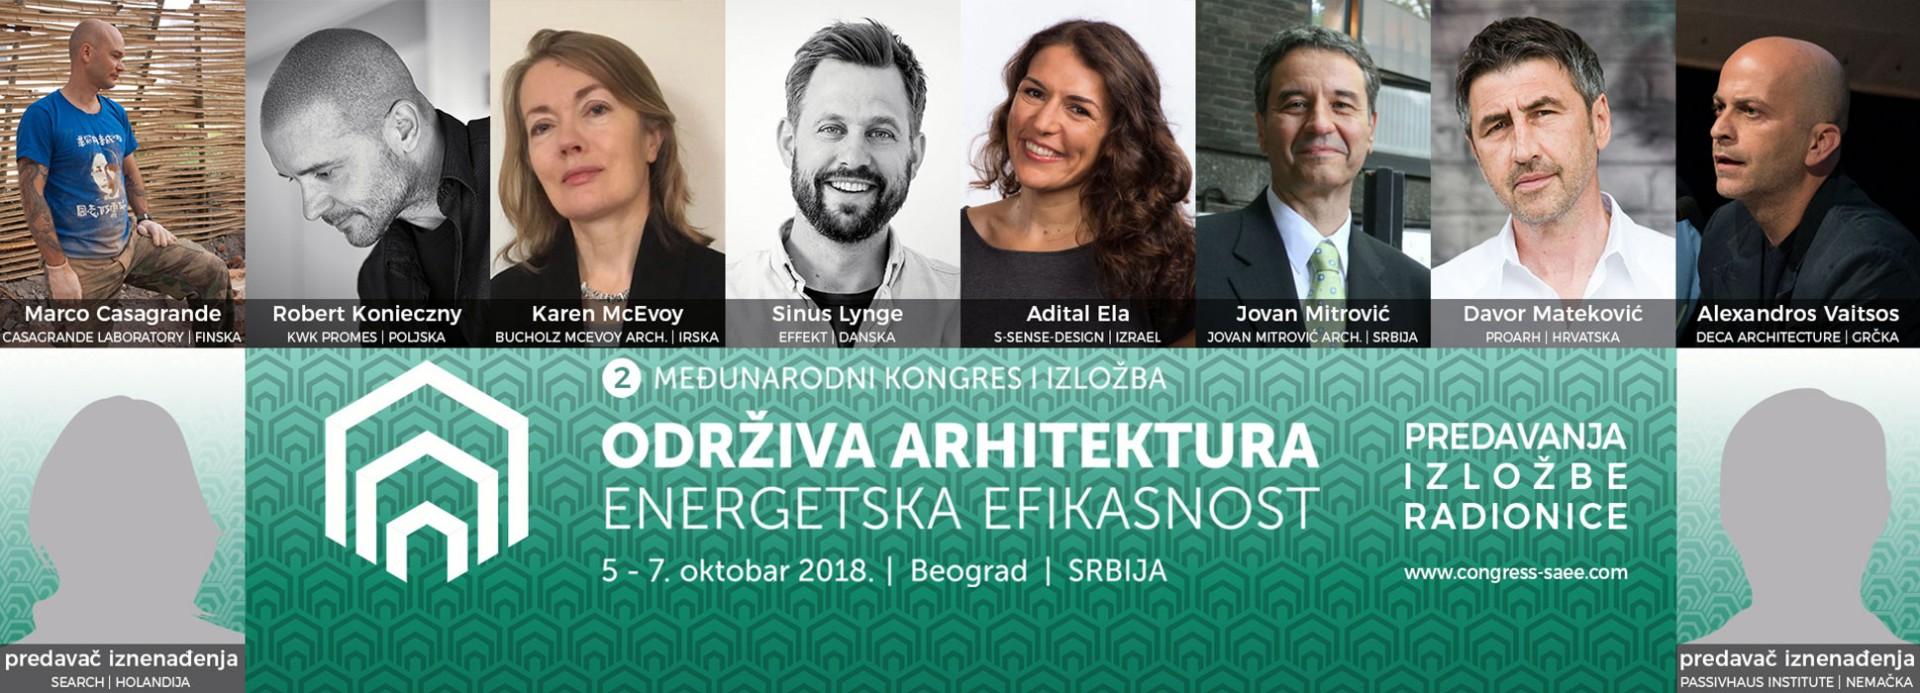 Drugi međunarodni kongres: Održiva arhitektura – energetska efikasnost (6-7. oktobar 2018.)